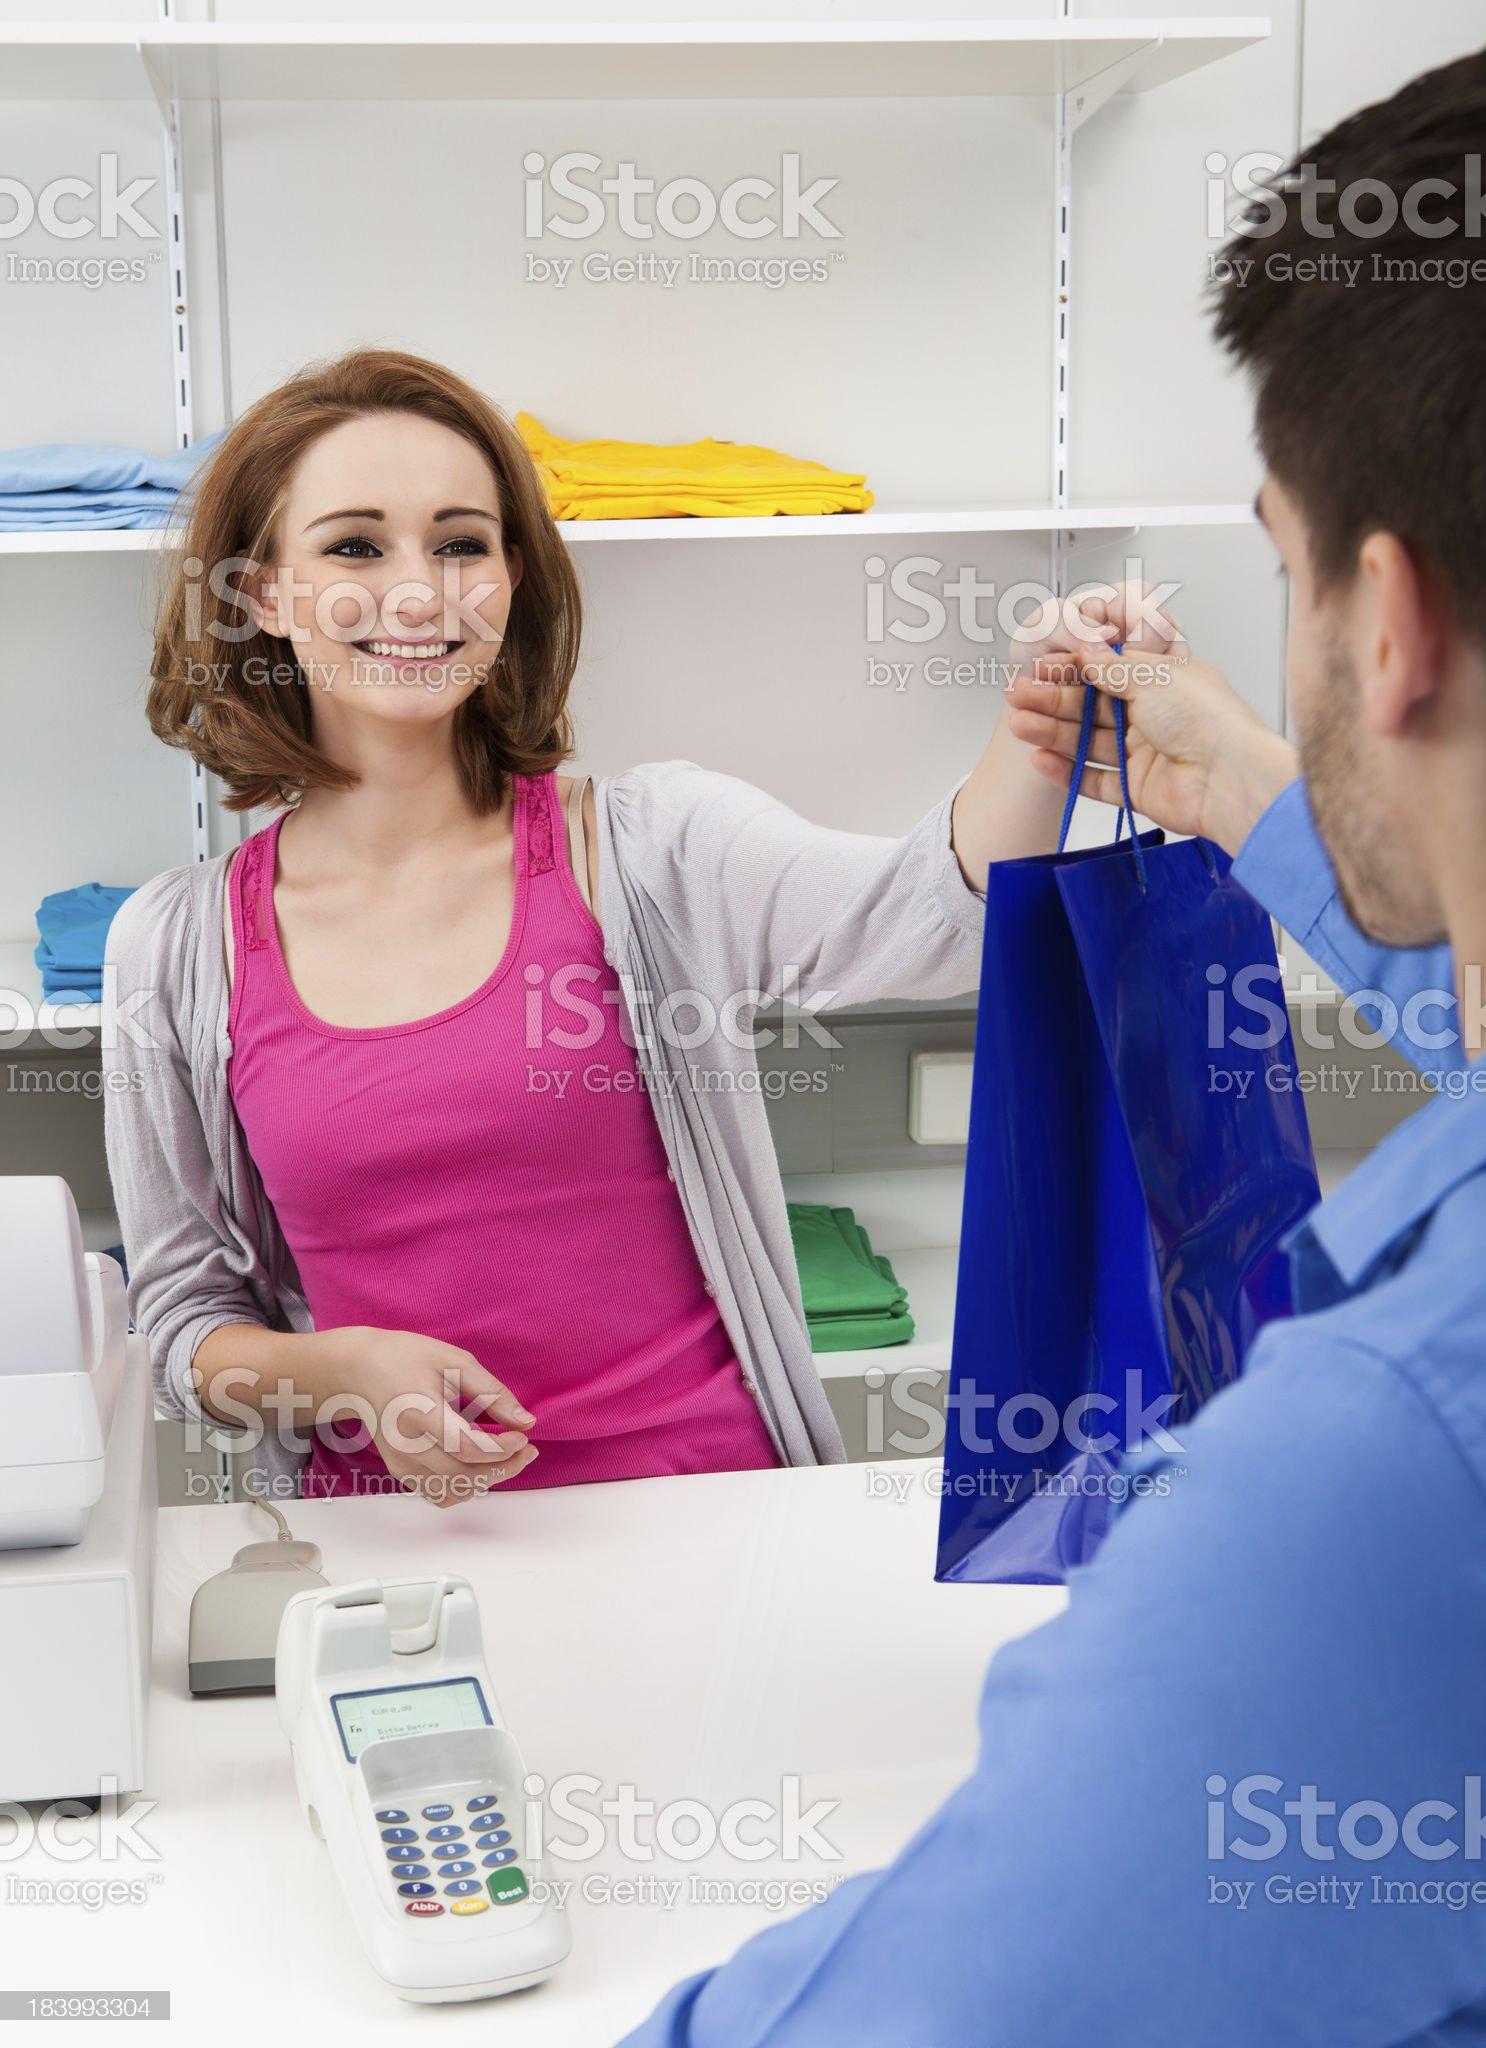 Cashier Handing Over Shopping Bag To Customer royalty-free stock photo